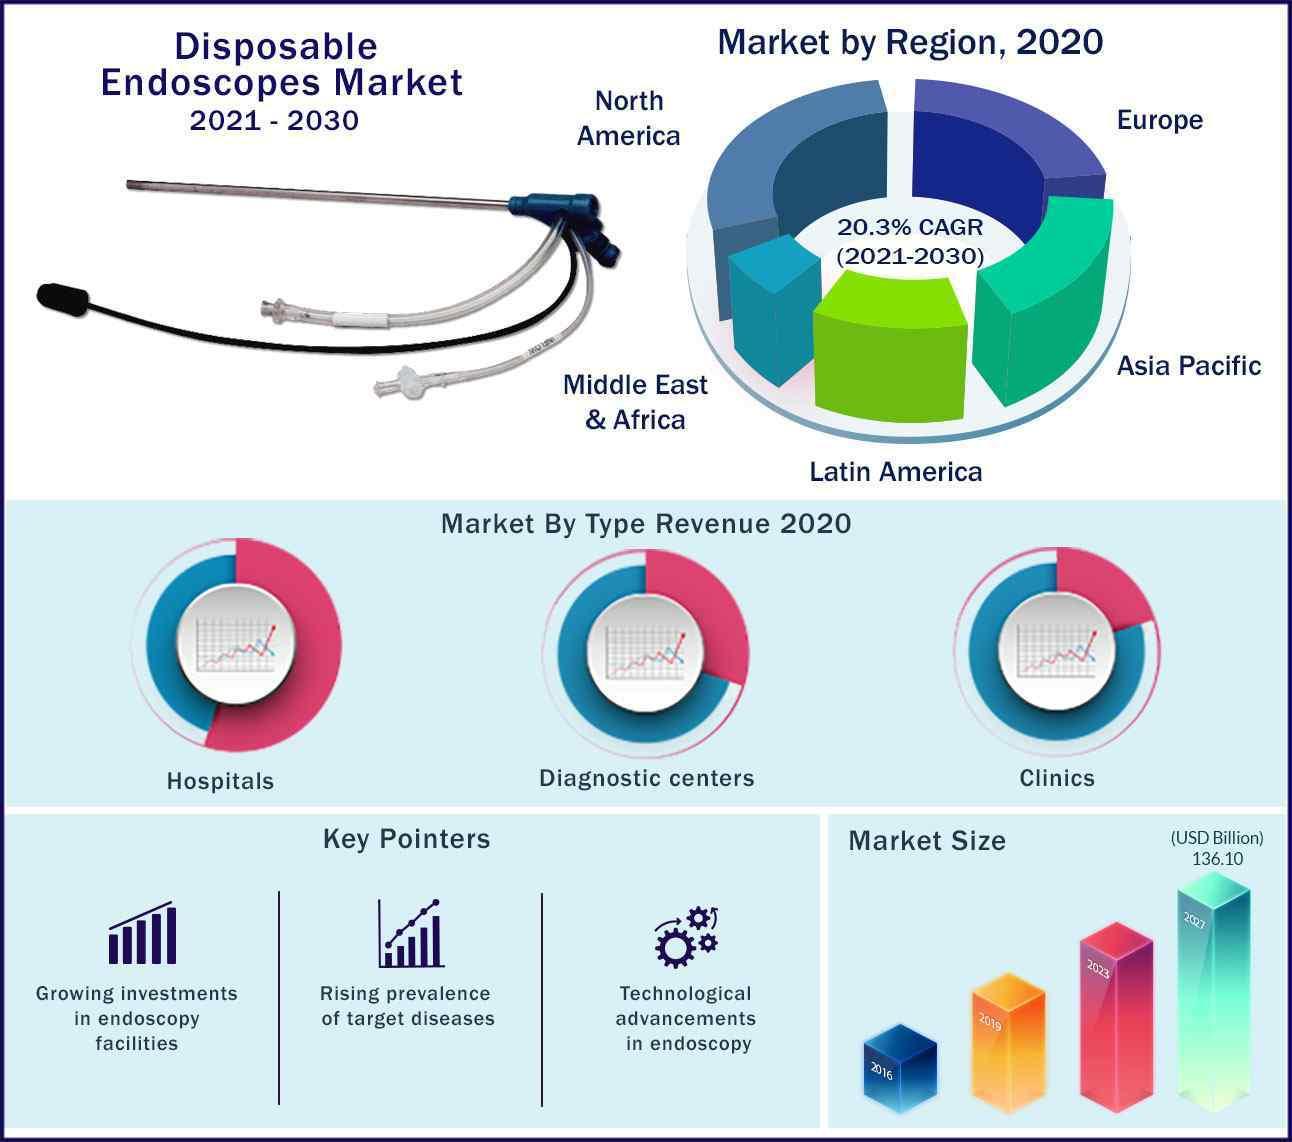 Global Disposable Endoscopes Market 2020 to 2027